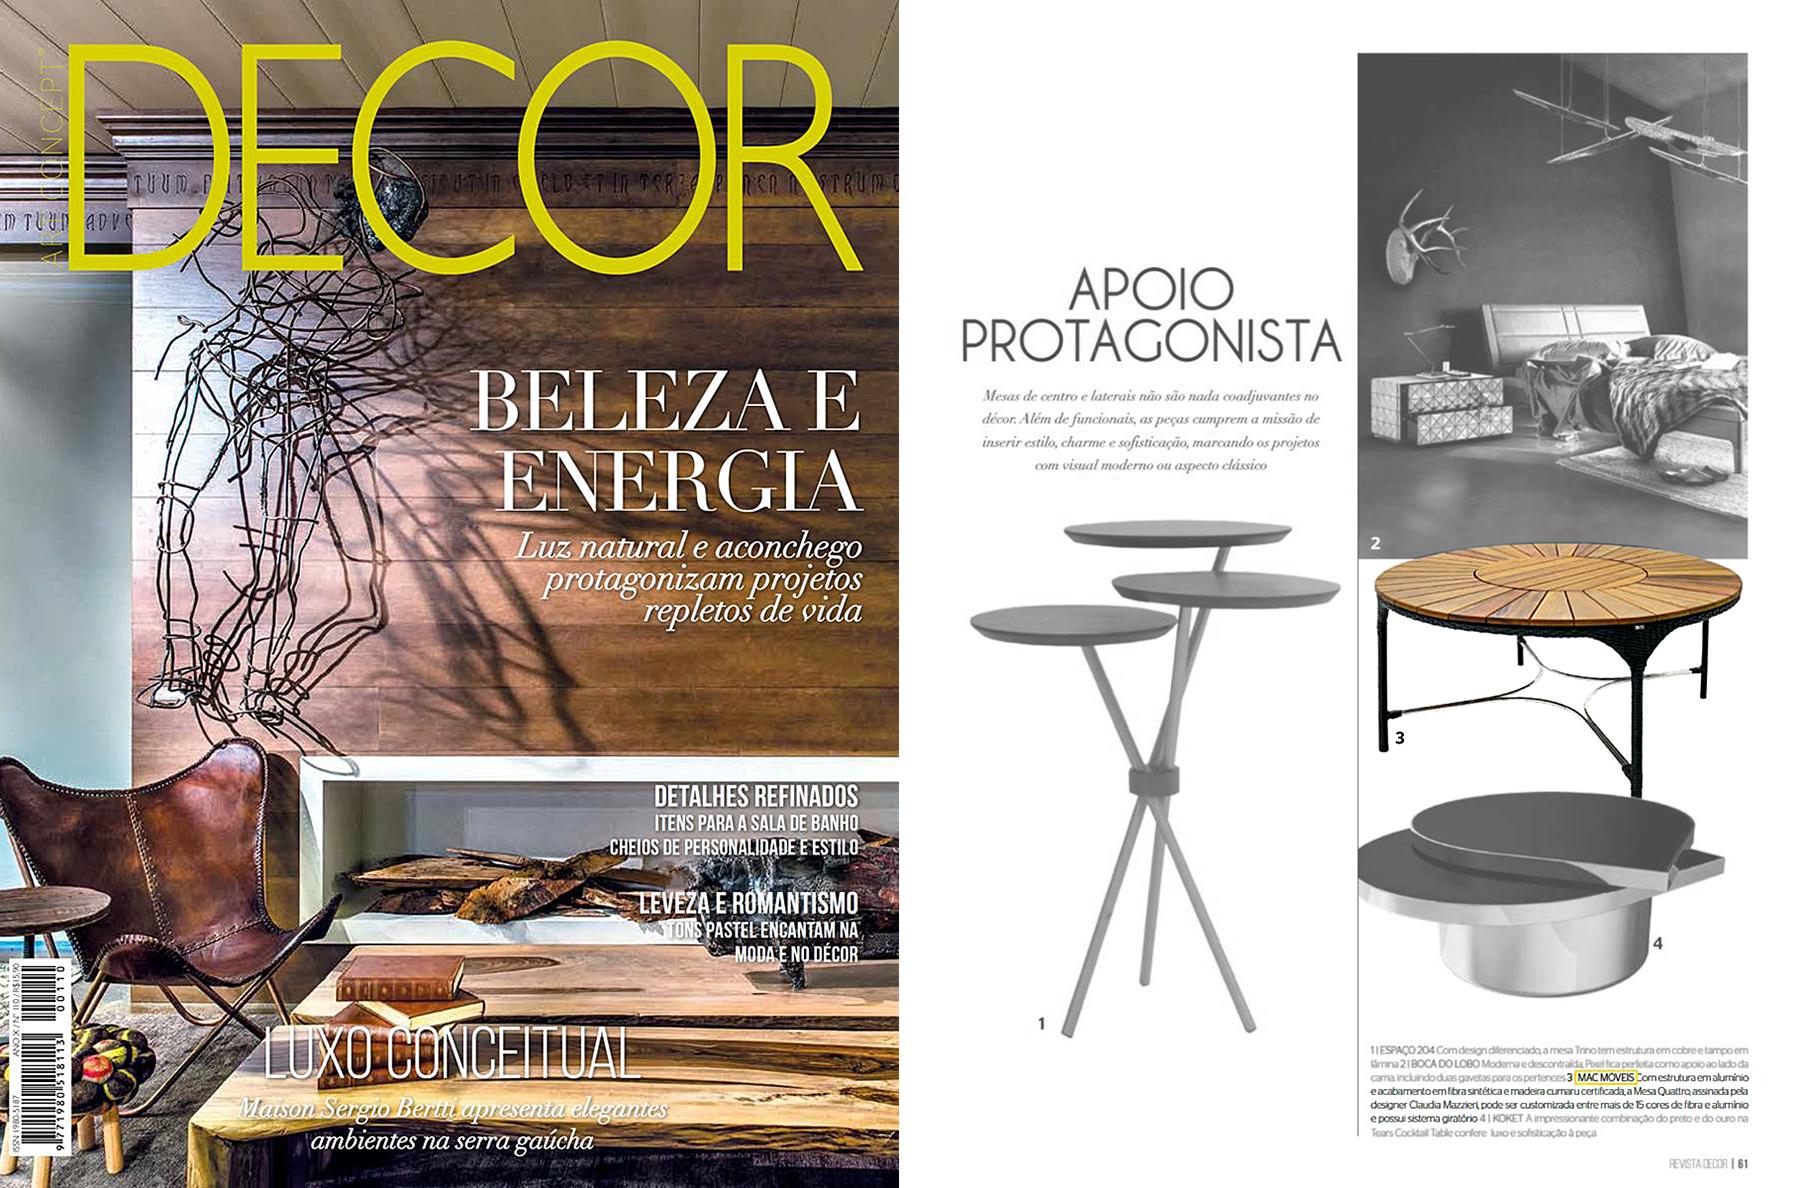 DECOR nº 110 - November 2015